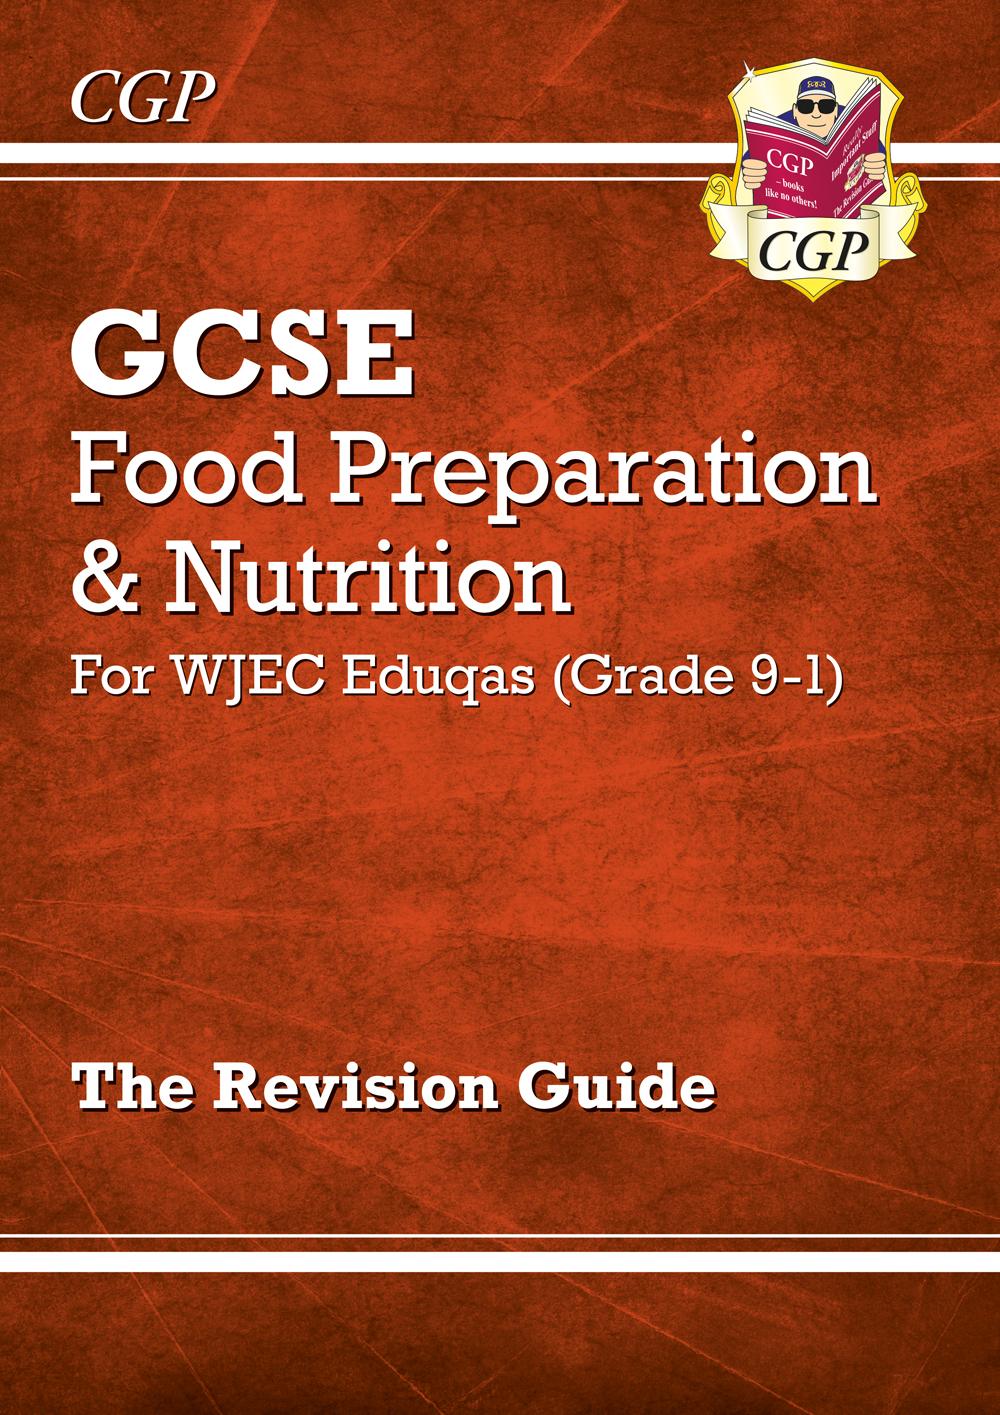 Grade 9-1 GCSE Food Preparation & Nutrition - WJEC Eduqas Revision Guide